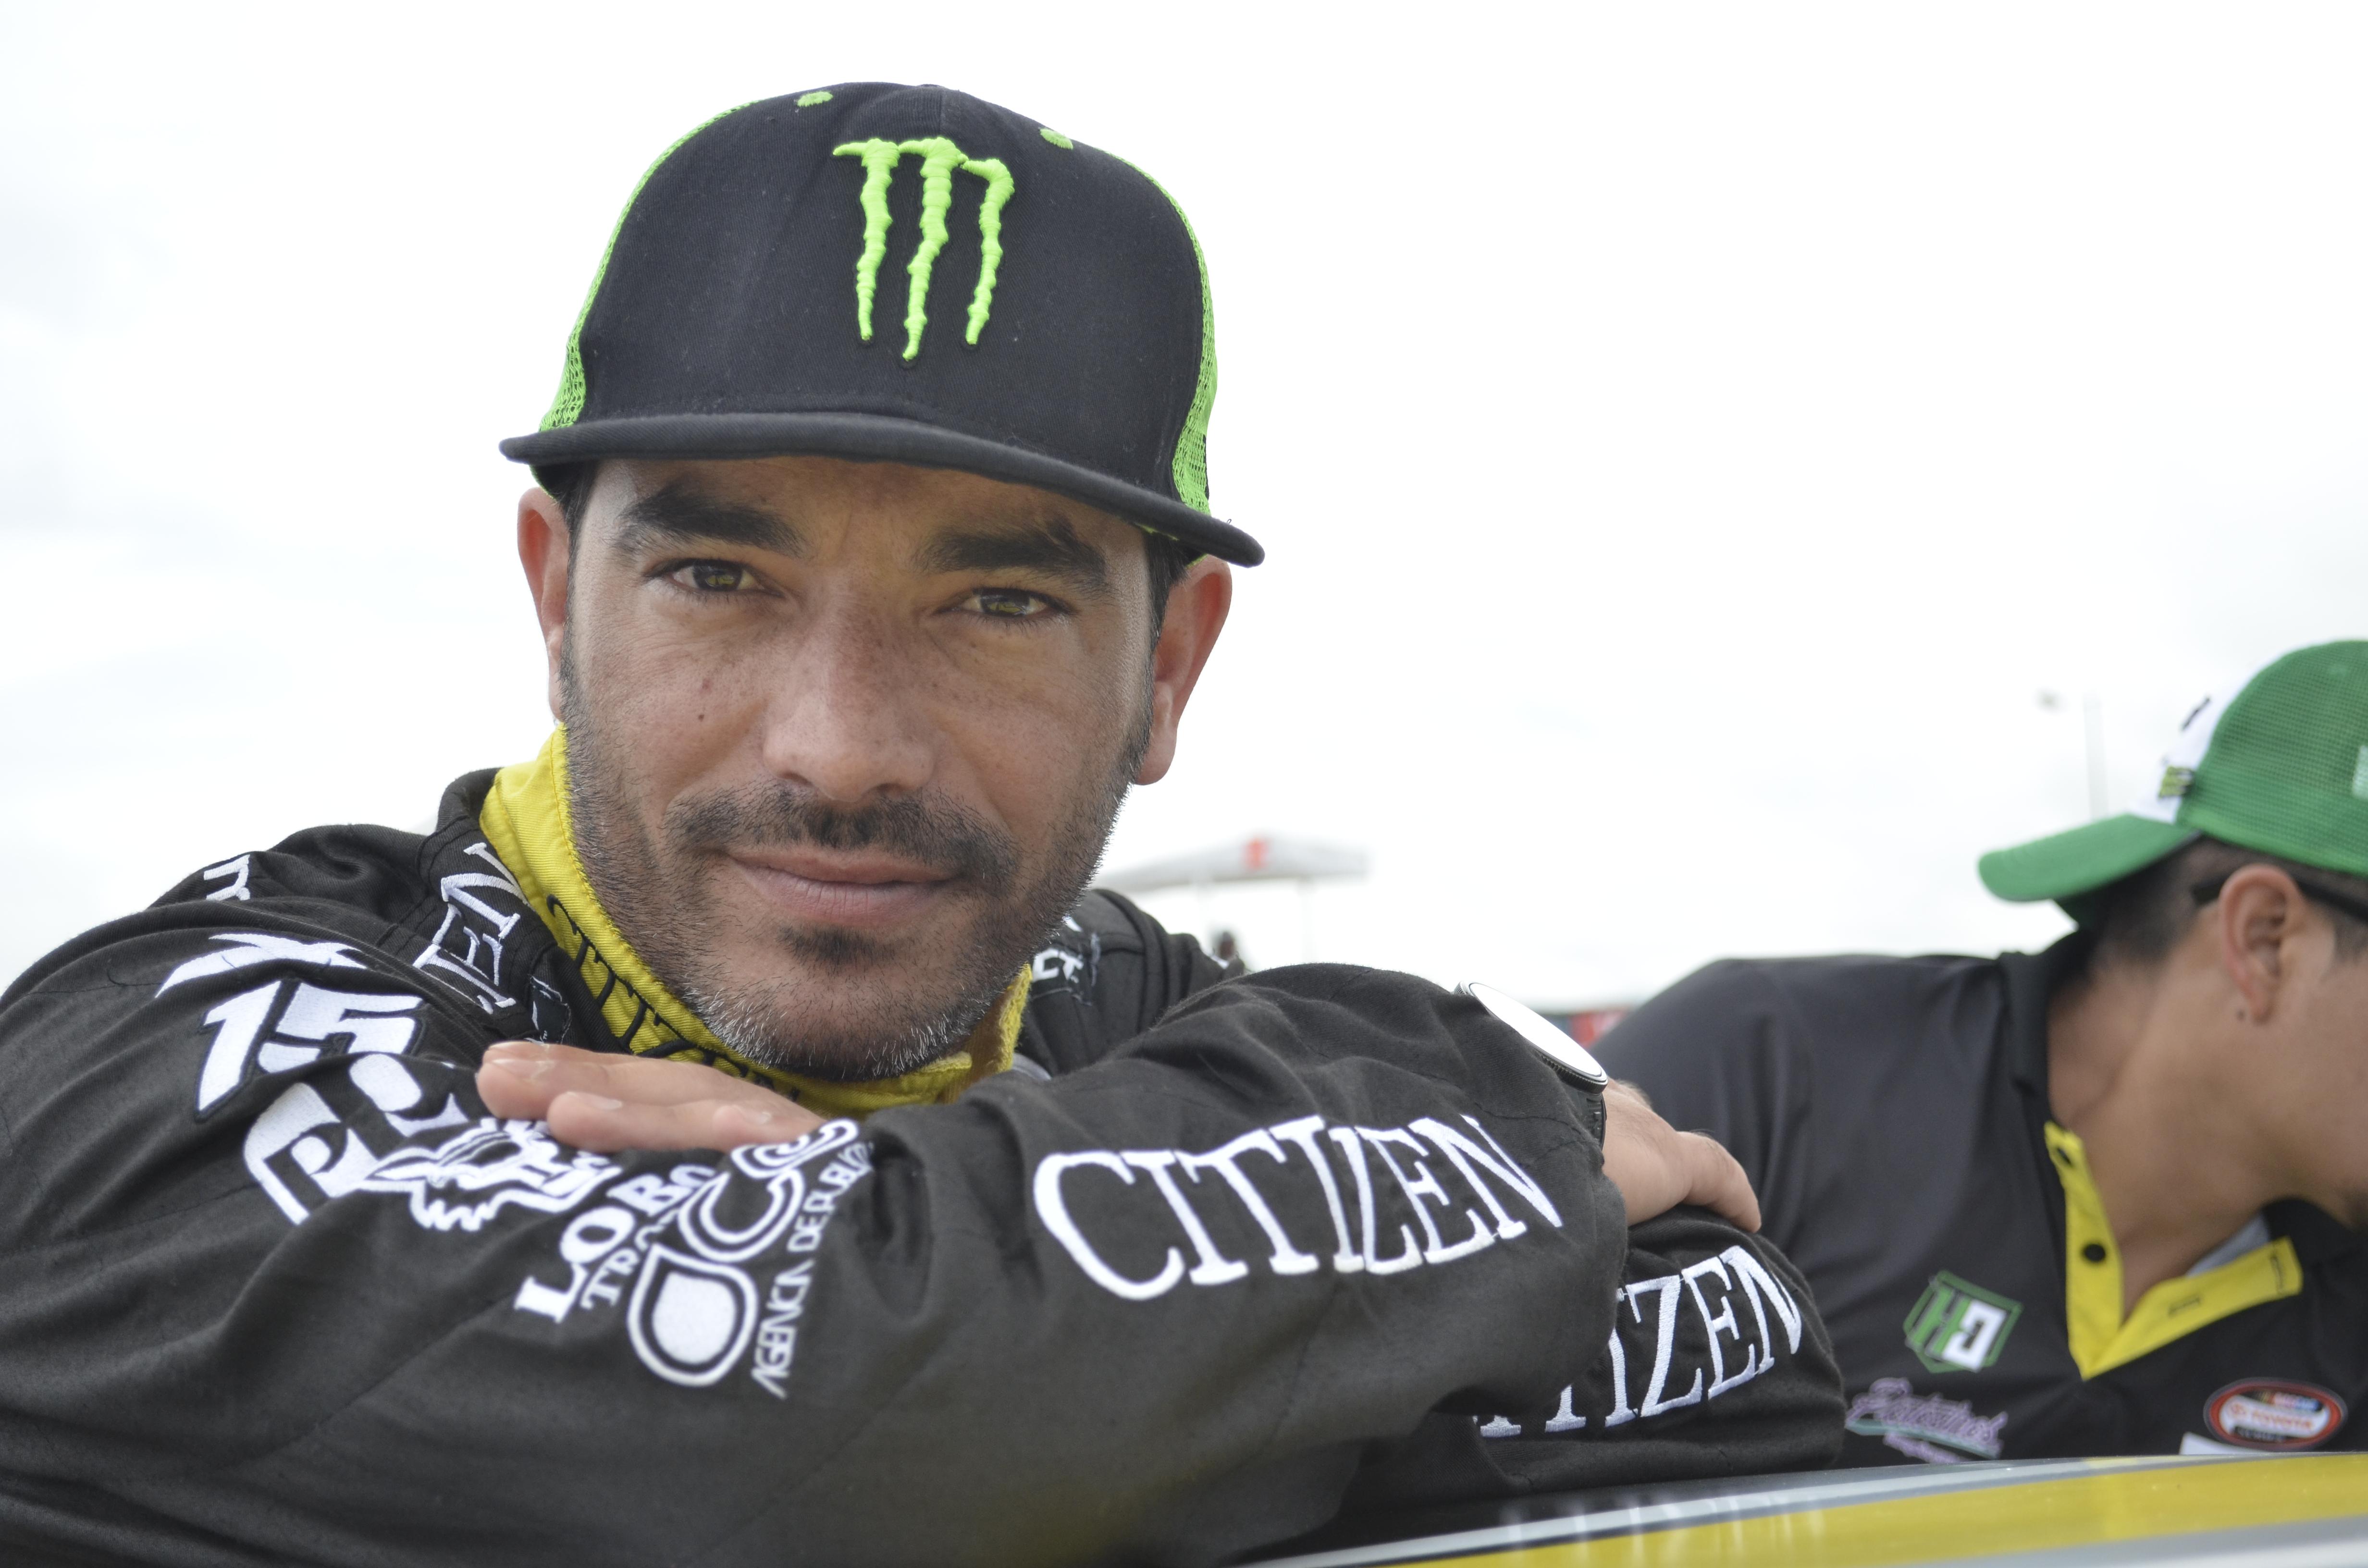 Rubén Pardo, una semana más como líder de NASCAR México